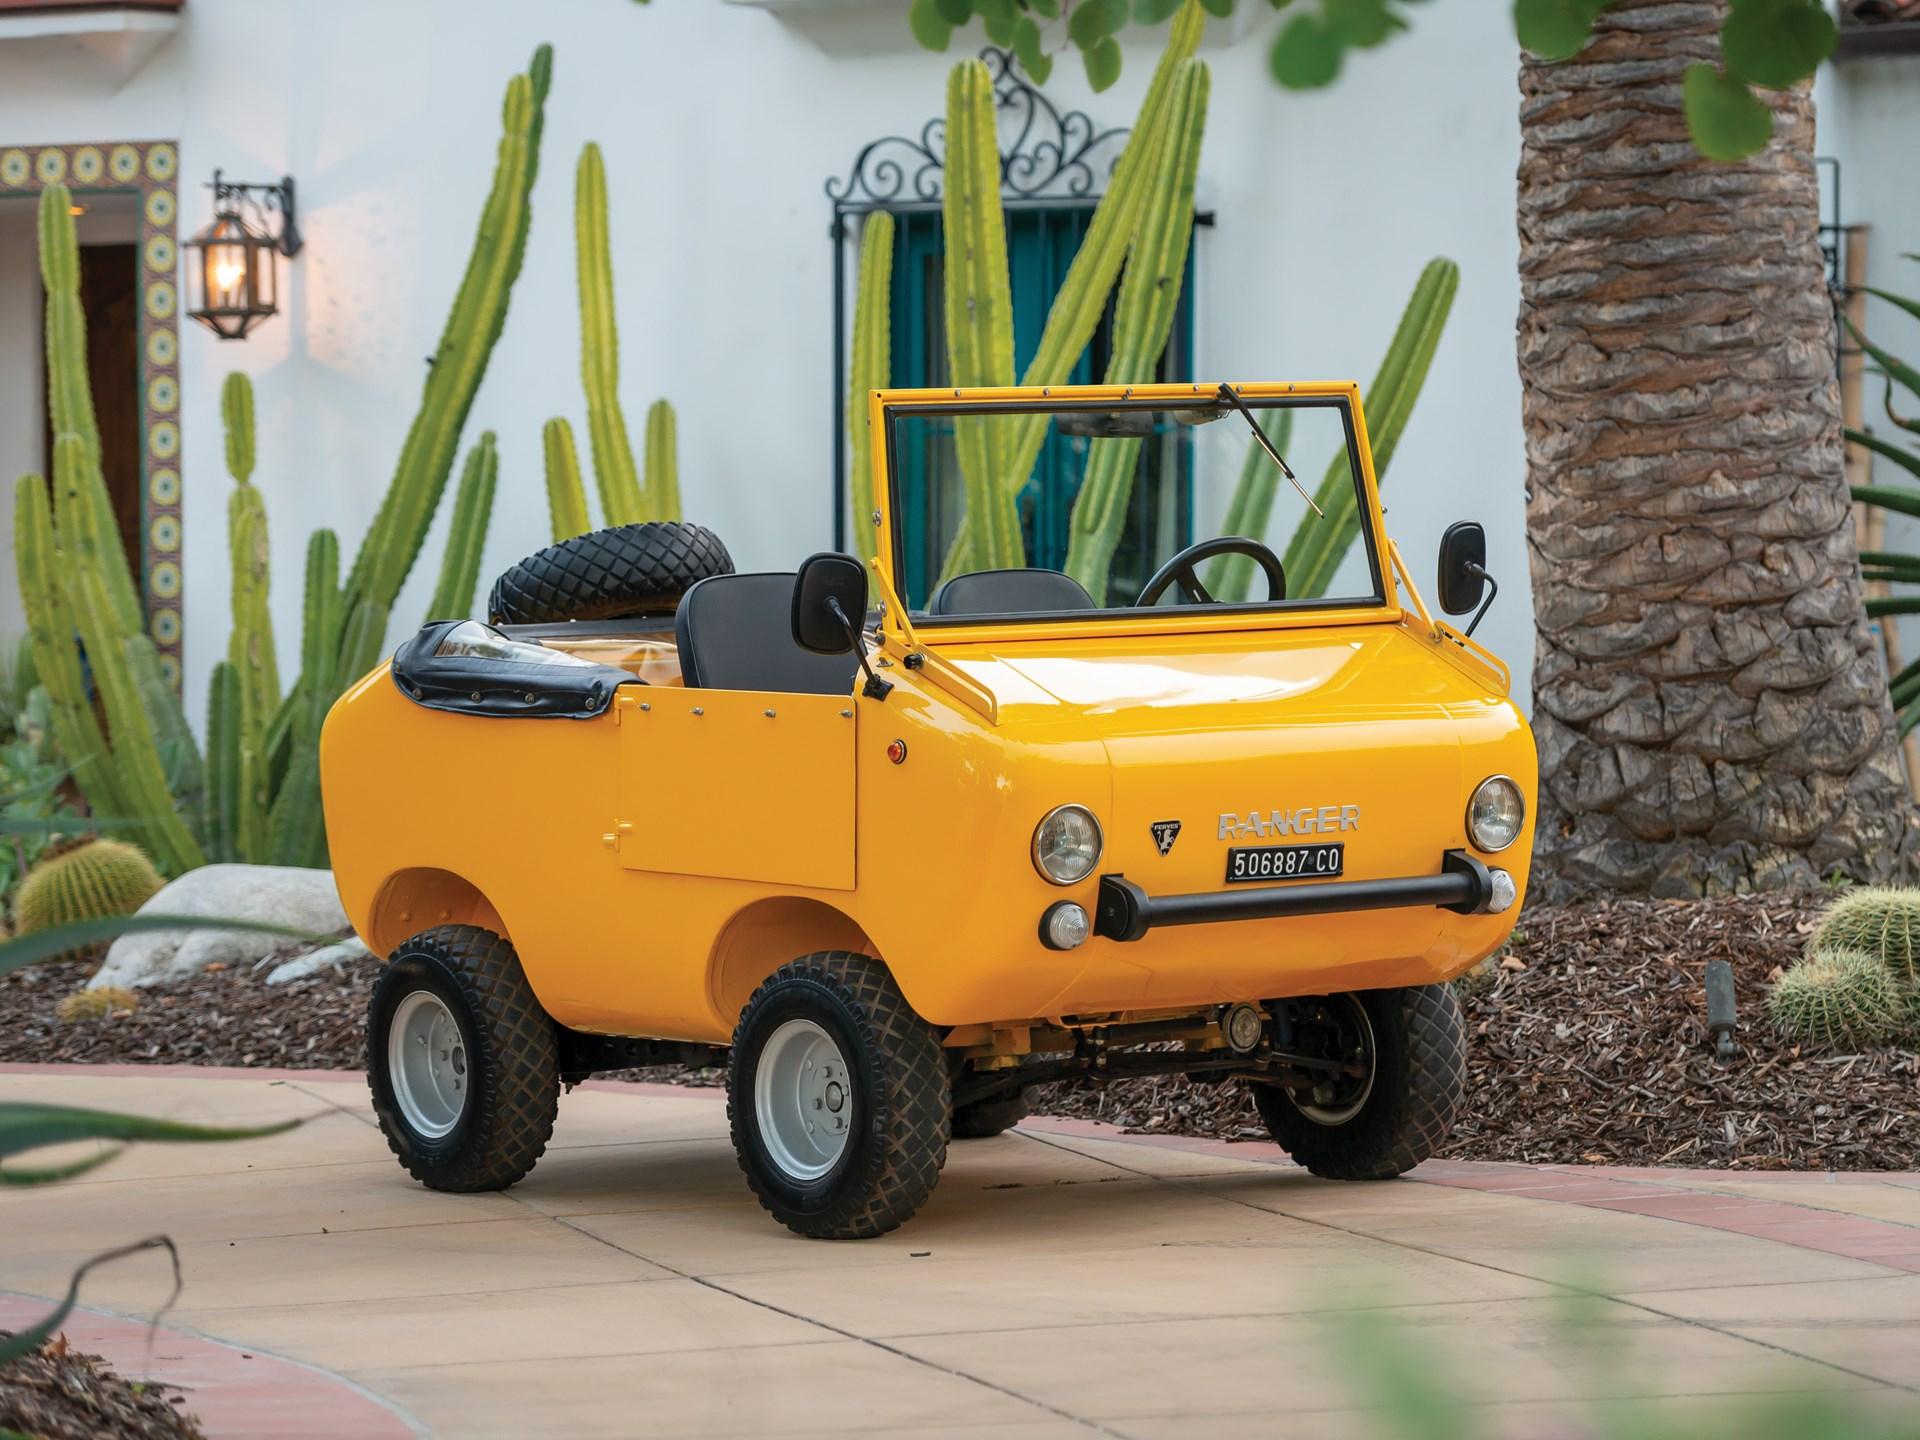 Ranger For Sale >> 15 Fun Filled Cars For Under 200 000 Gtspirit